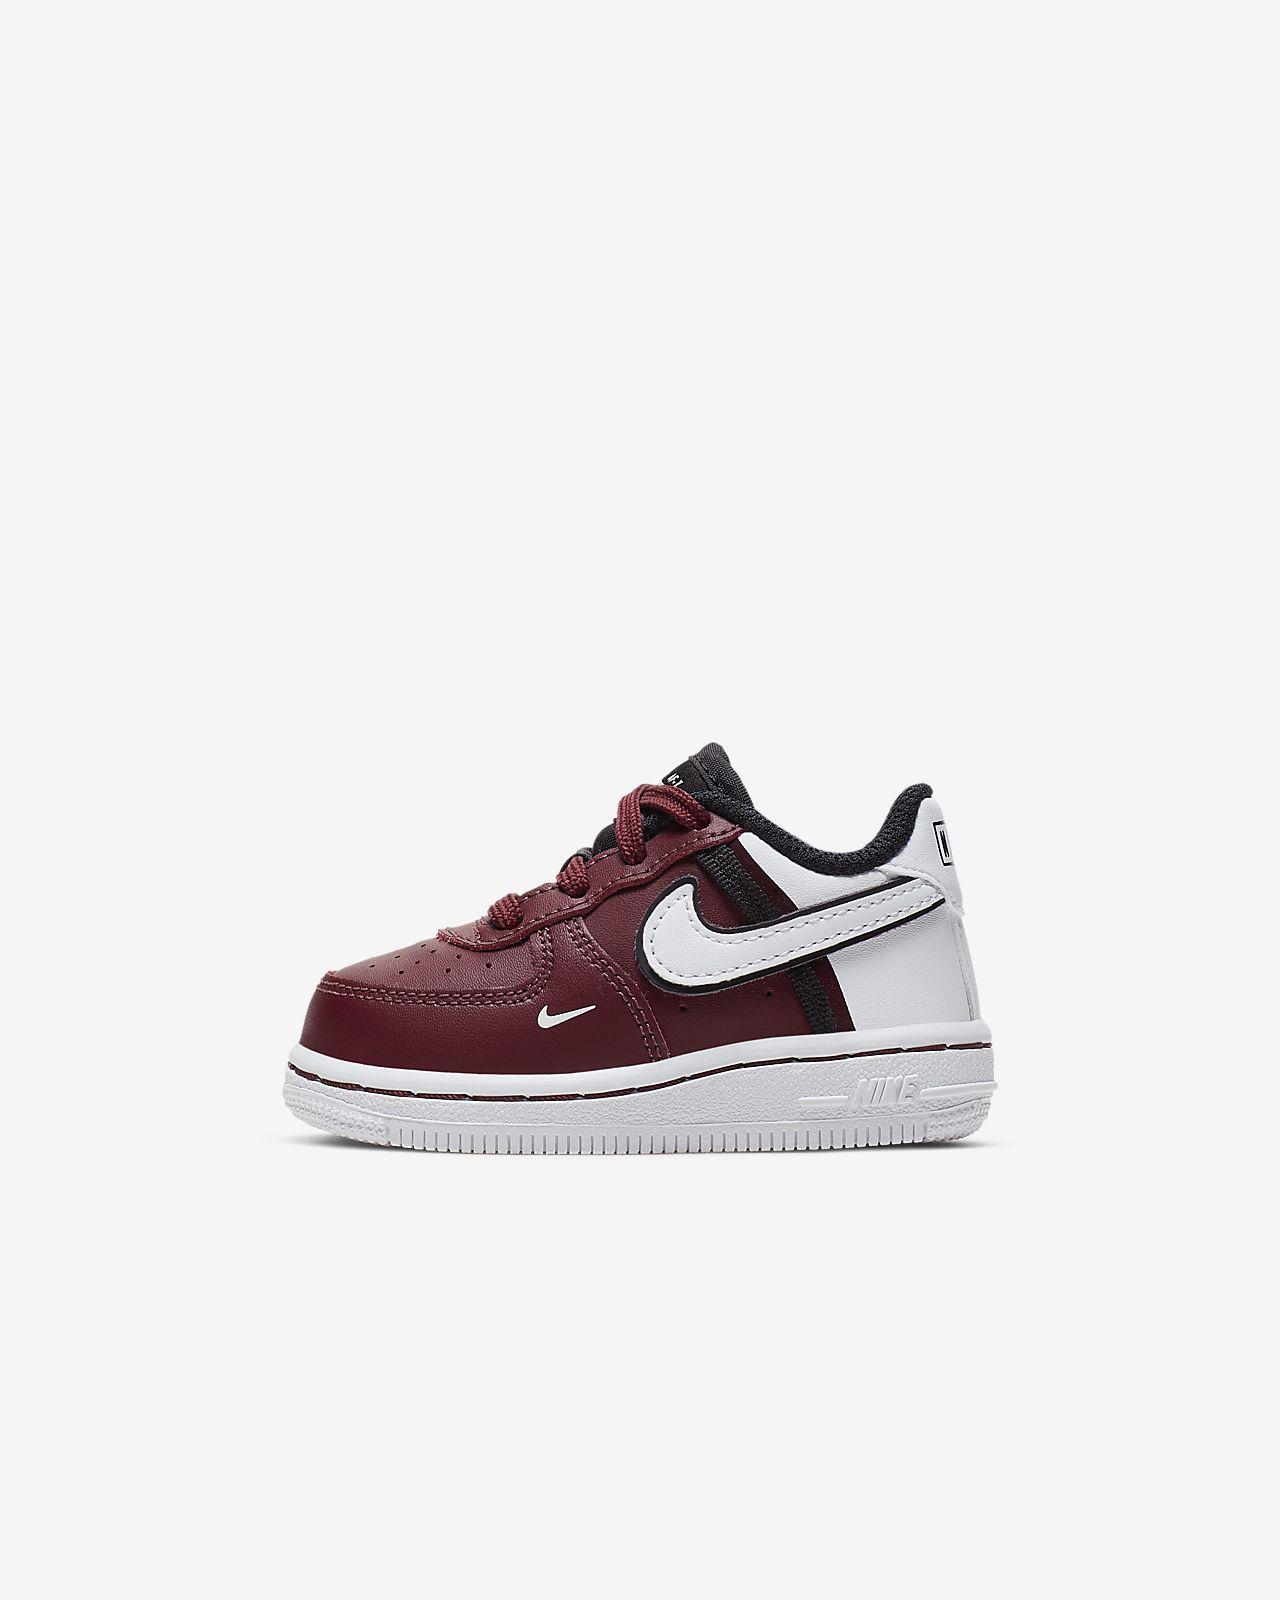 Nike Force 1 LV8 2 Baby/Toddler Shoe